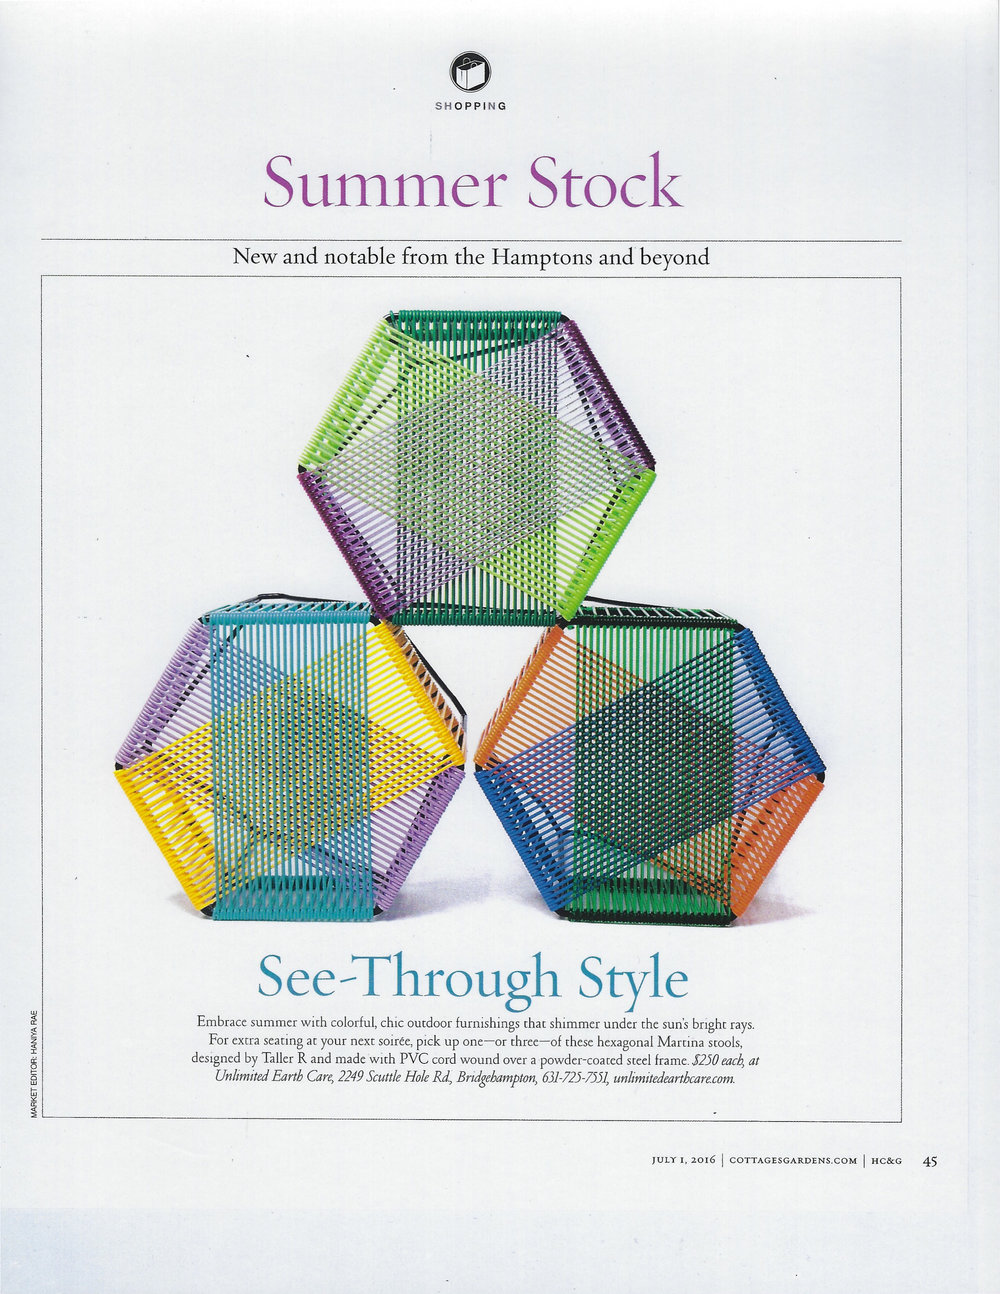 HC&G_Summer Stock 1.jpg